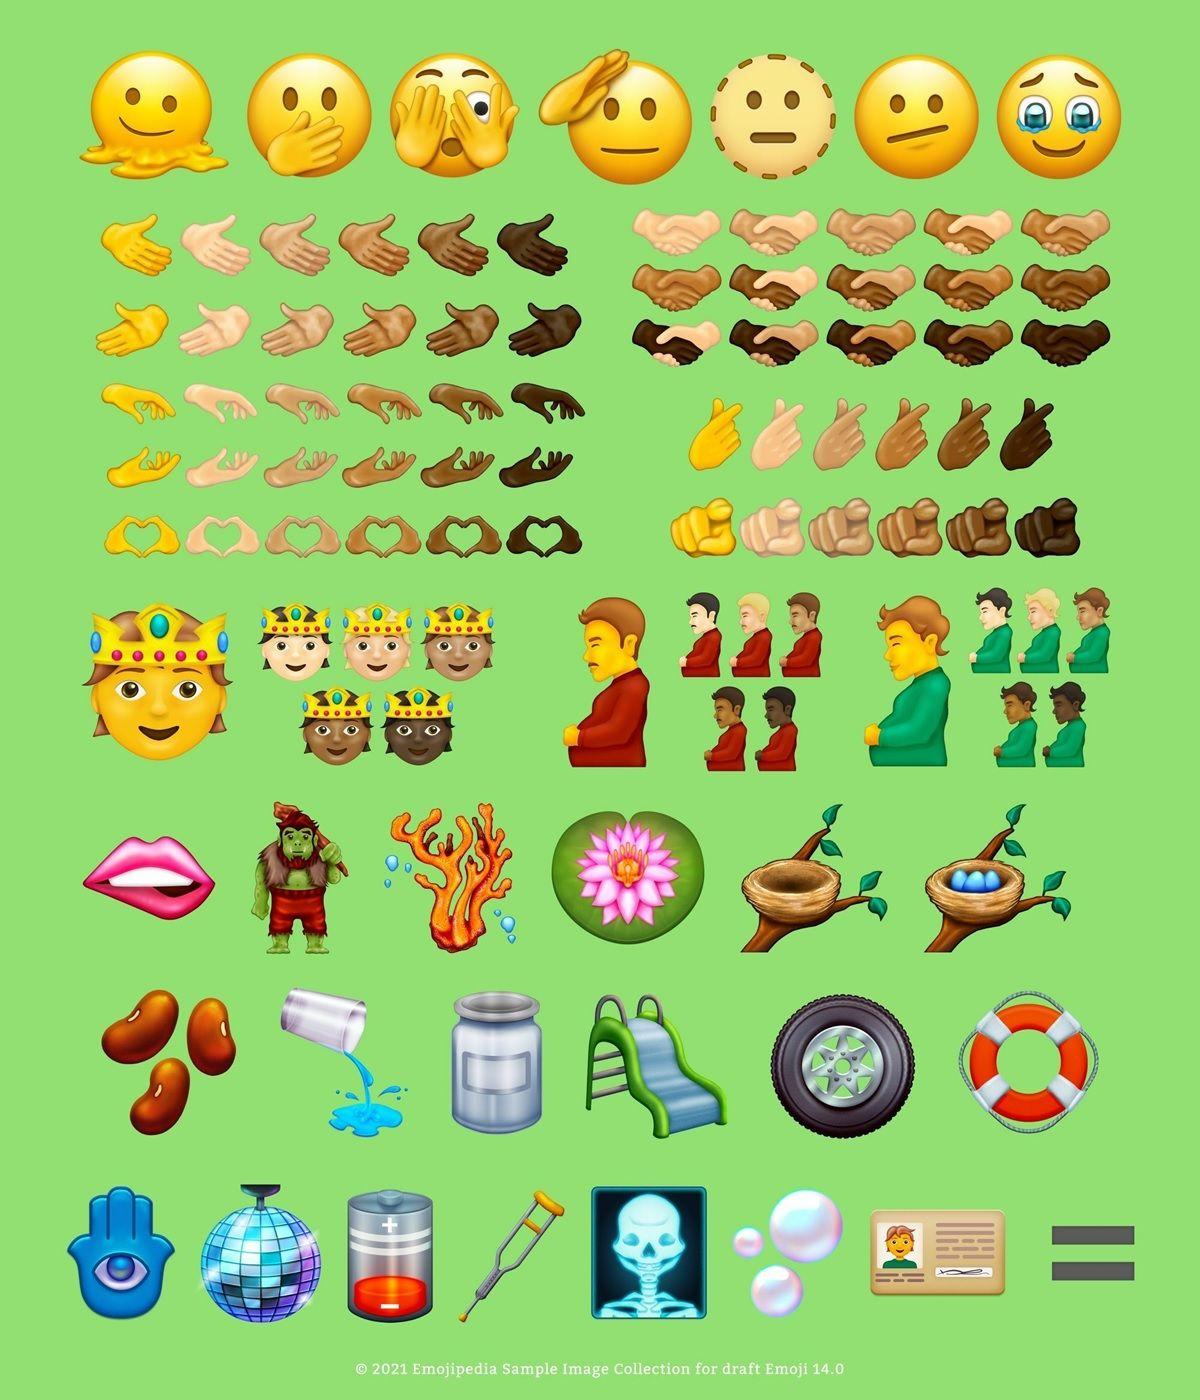 nuevos emojis para 2021